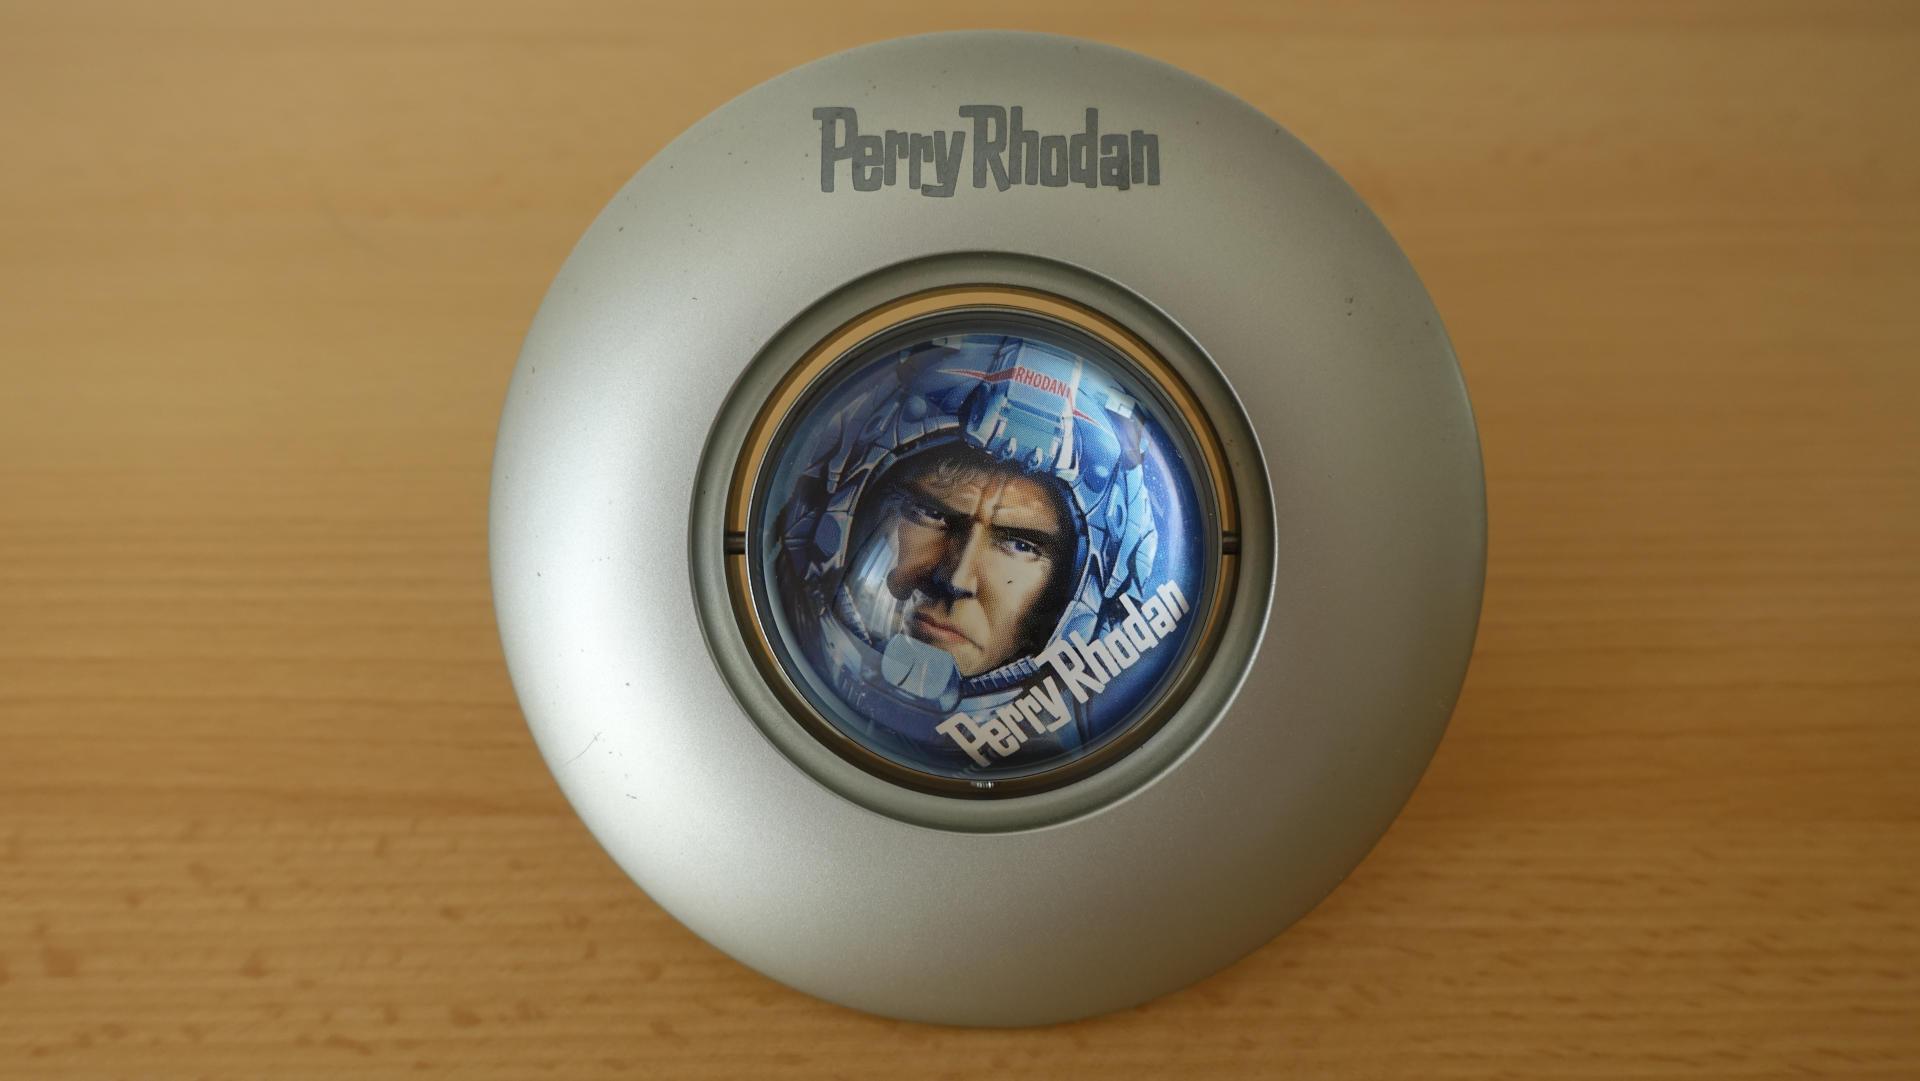 Perry Rhodan Tischuhr